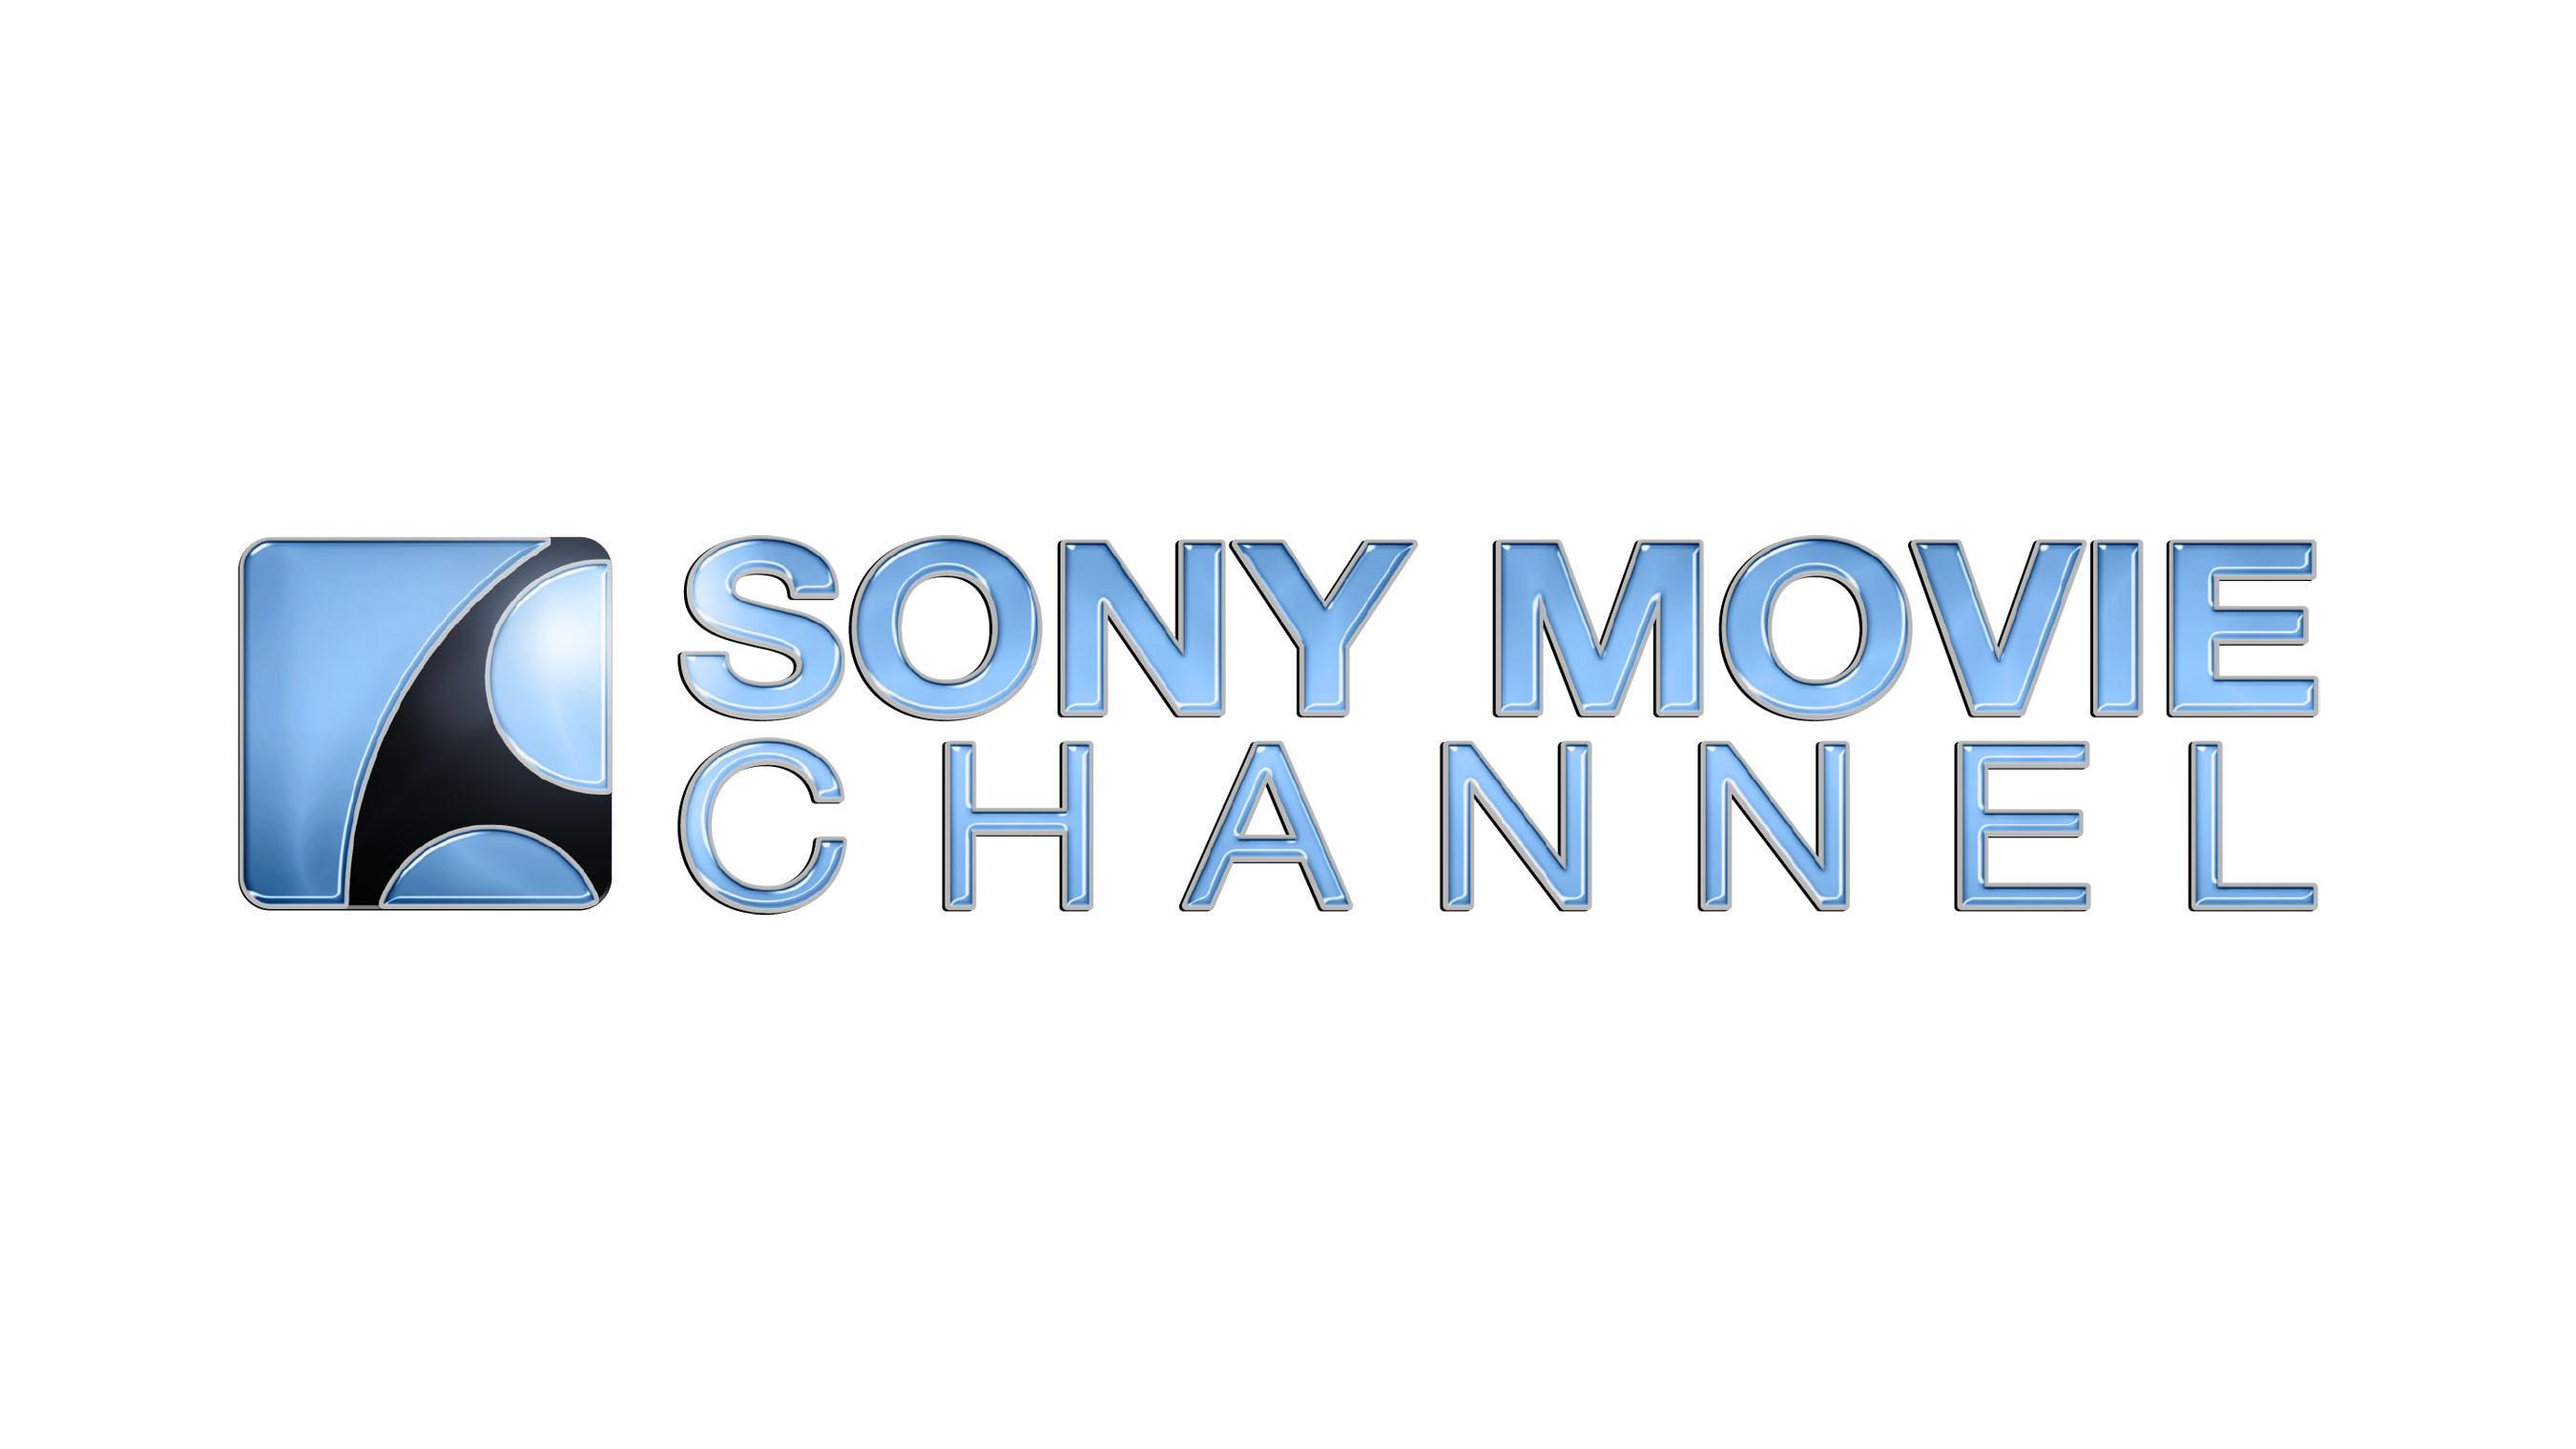 Sony Movie Channel logo.